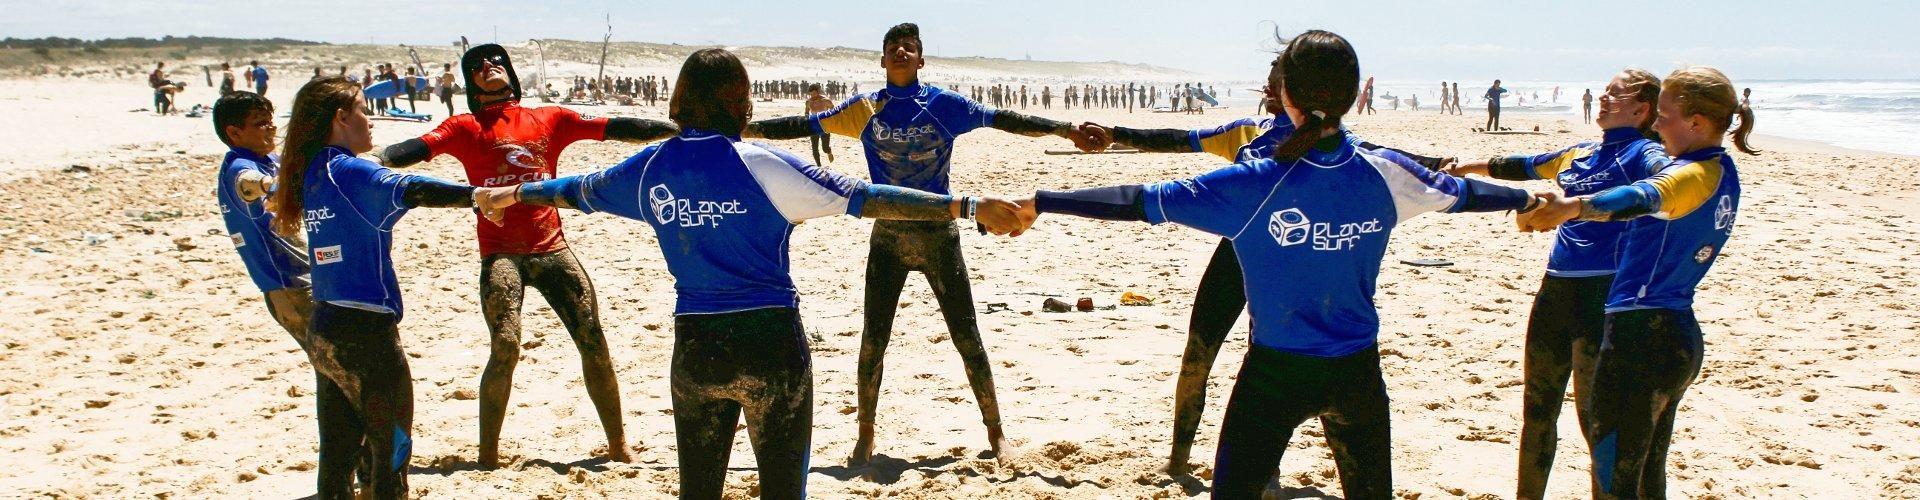 Cursos de surf juveniles en Francia